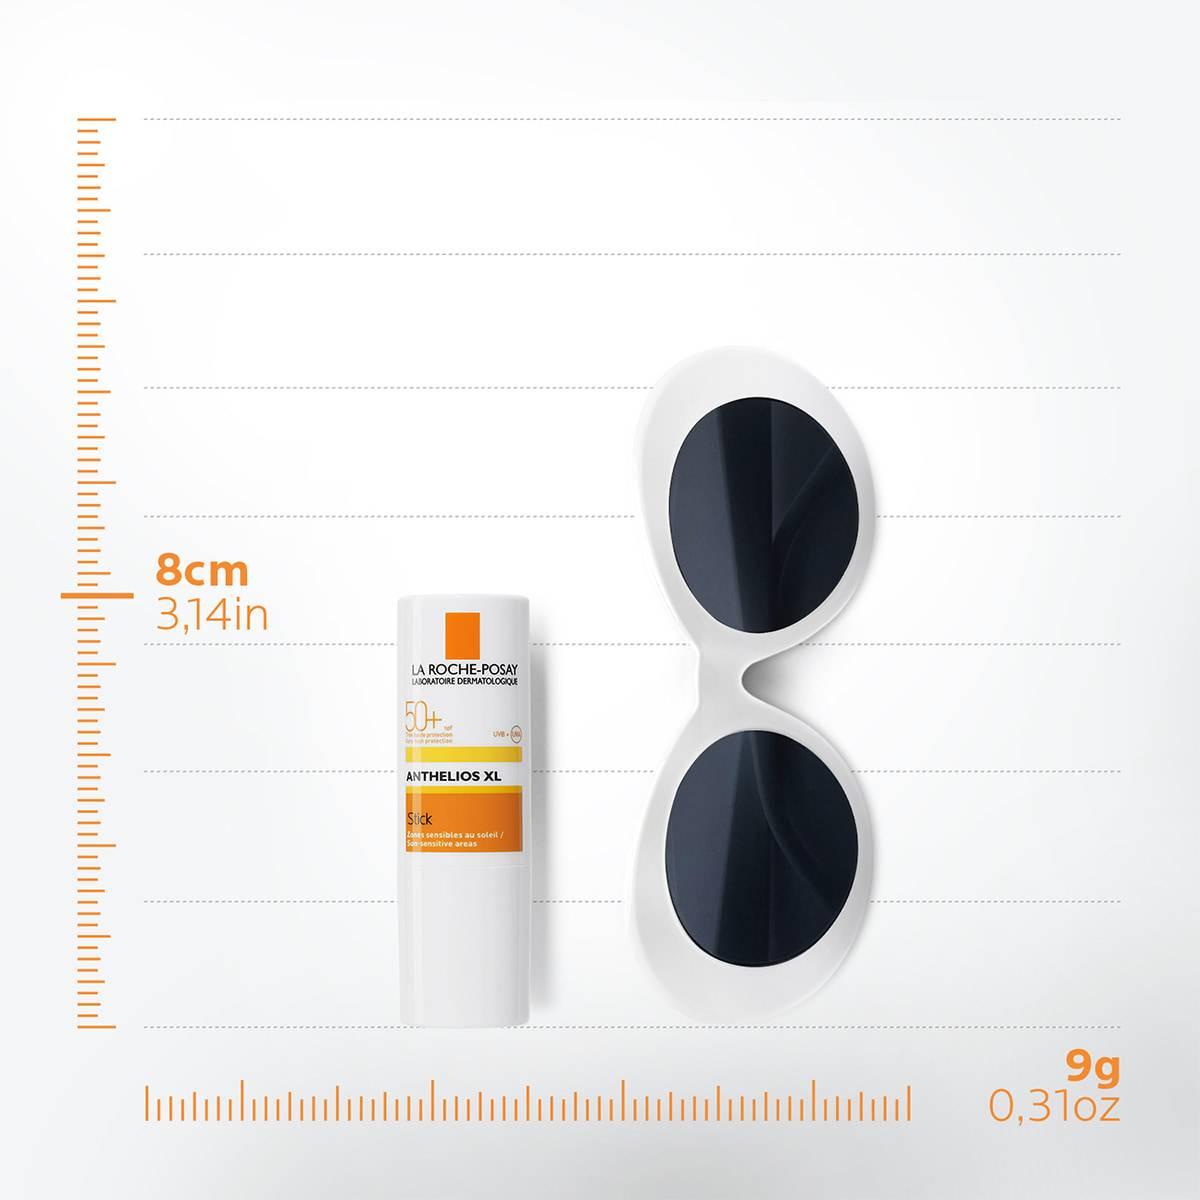 La Roche Posay ProduktSide Sol Anthelios XL Stick Sensitive Area Spf50